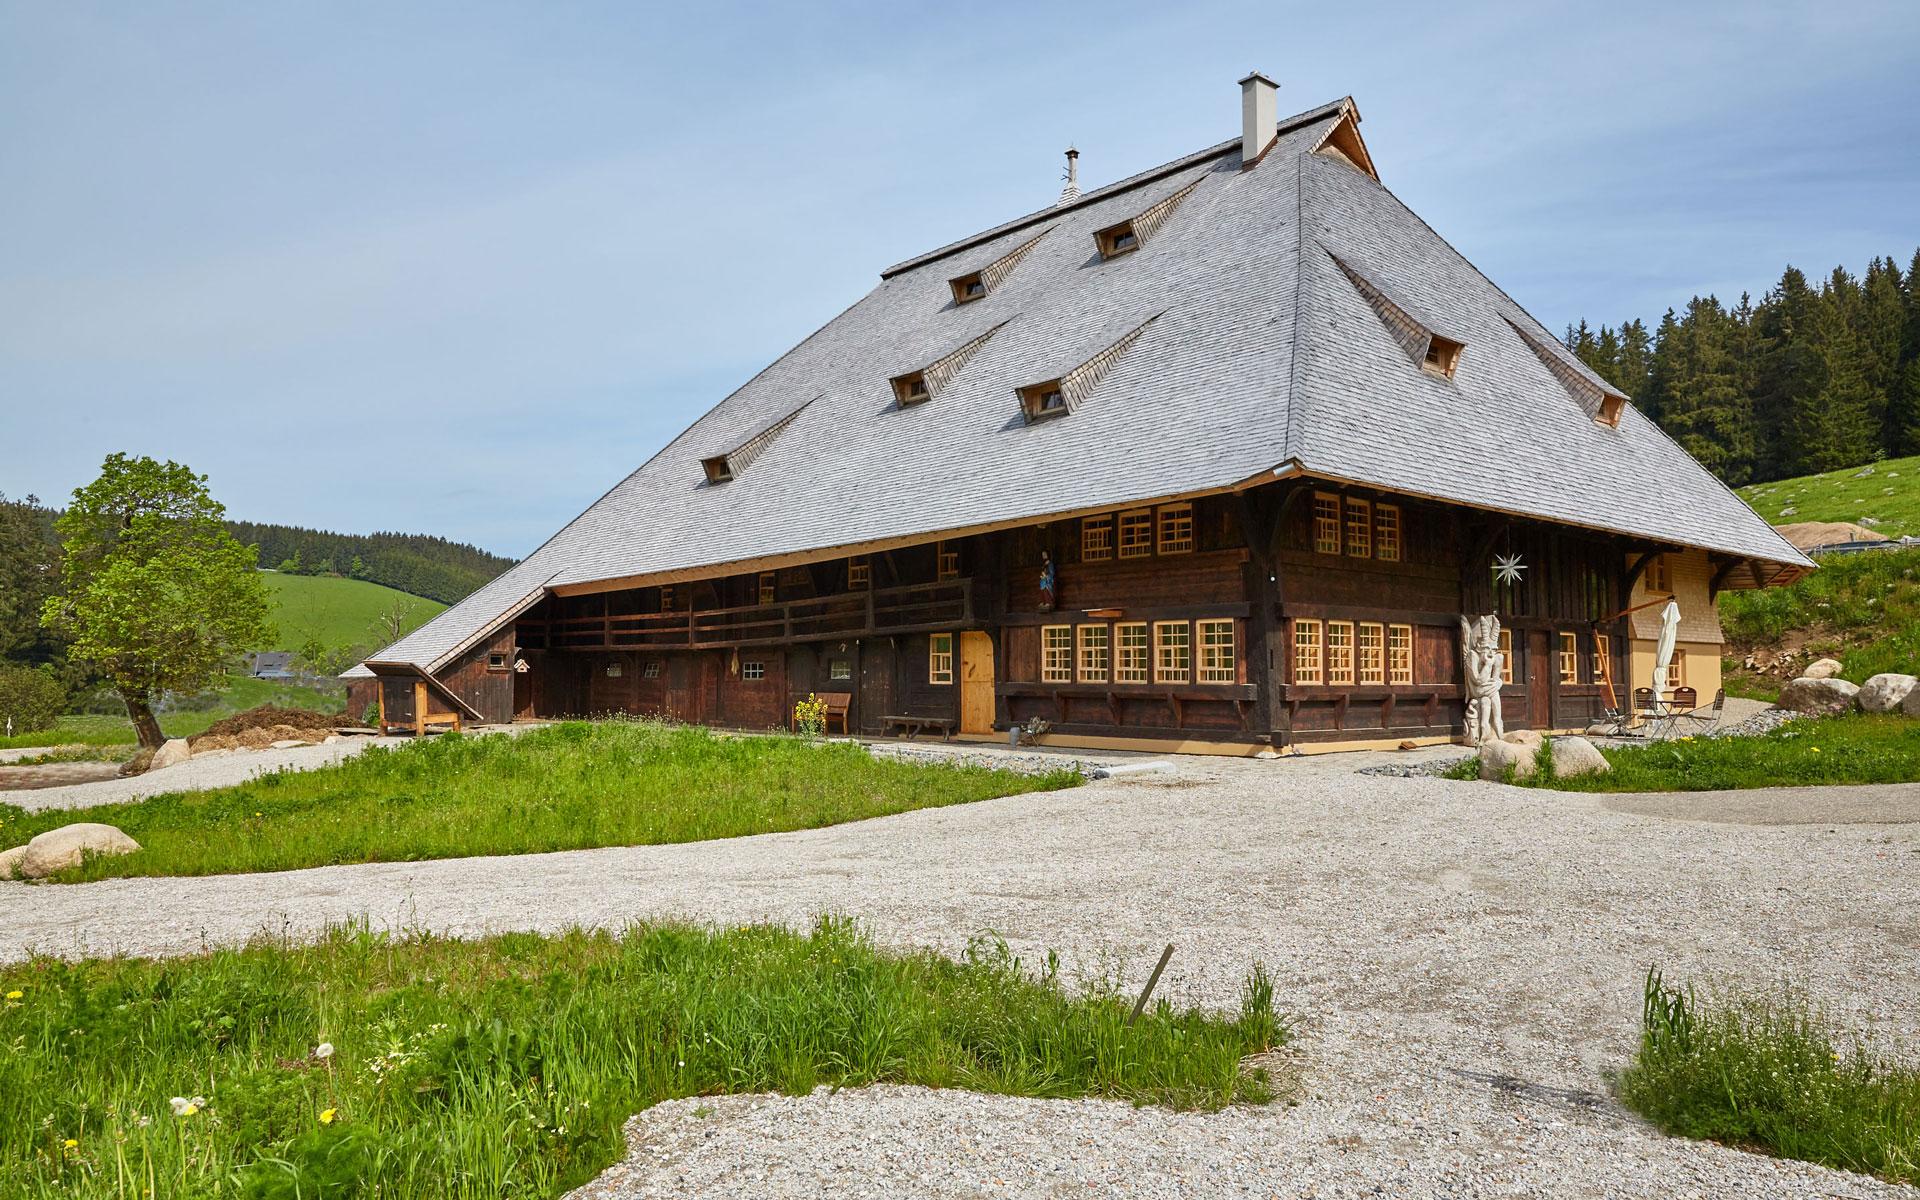 Kienzlerhansenhof